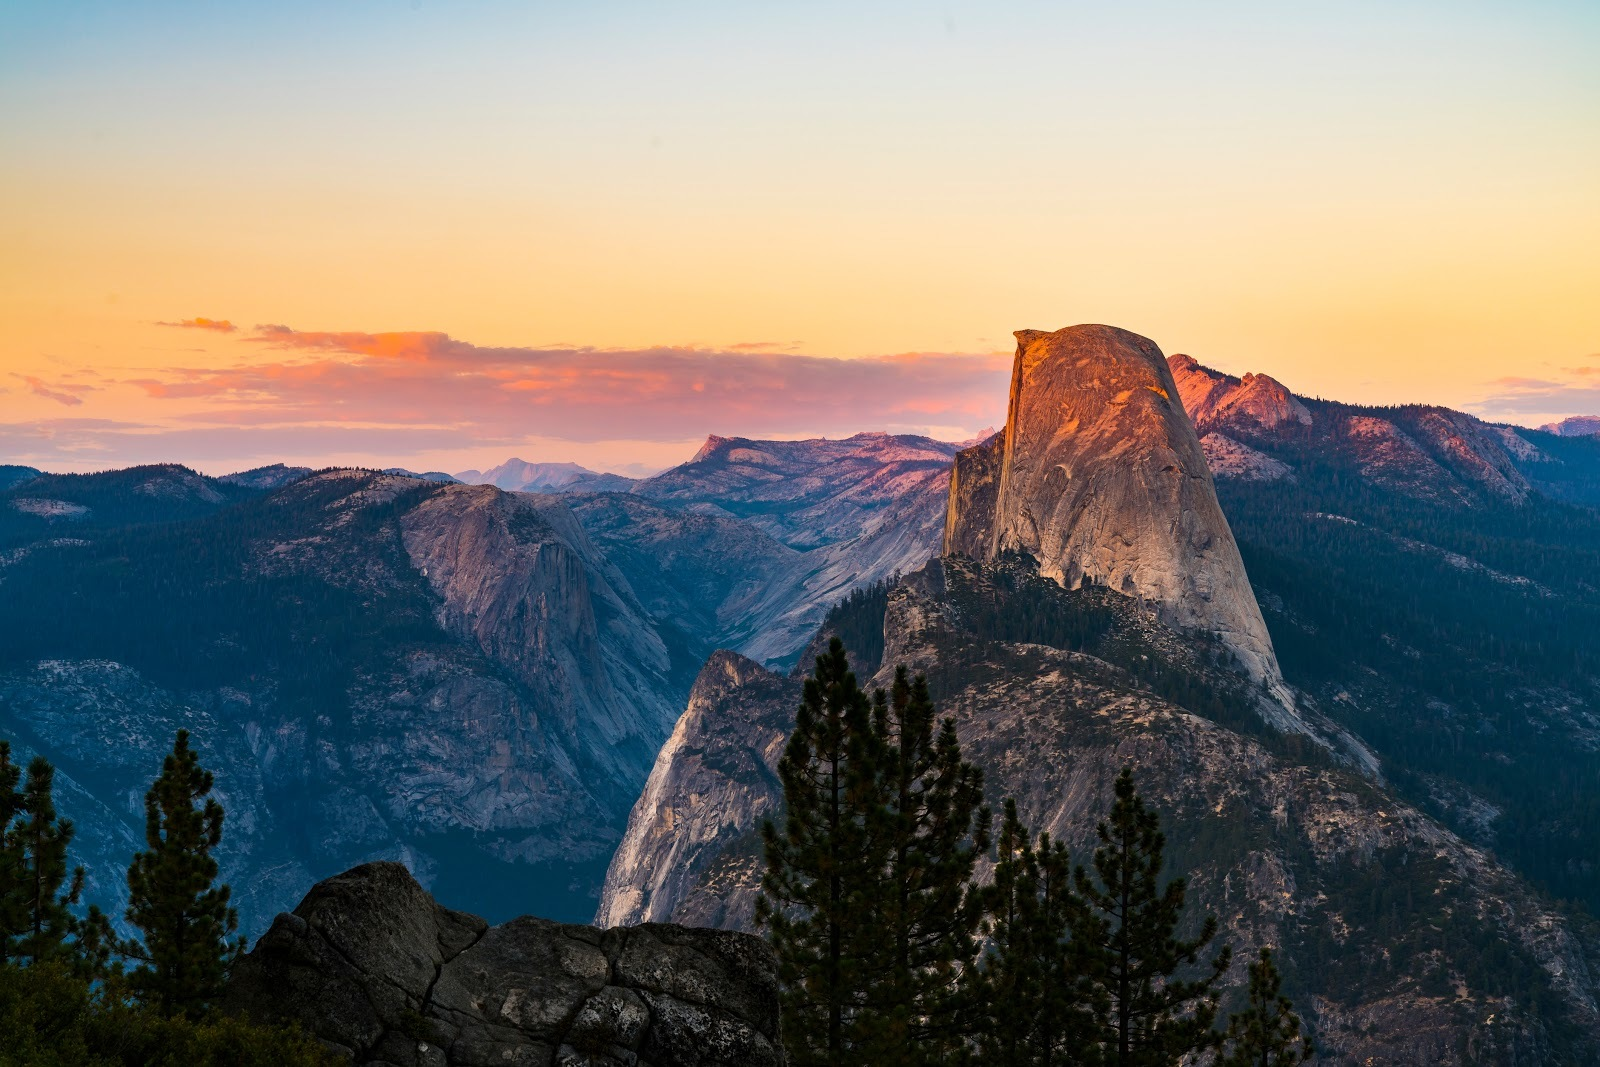 Glacier point at sunset